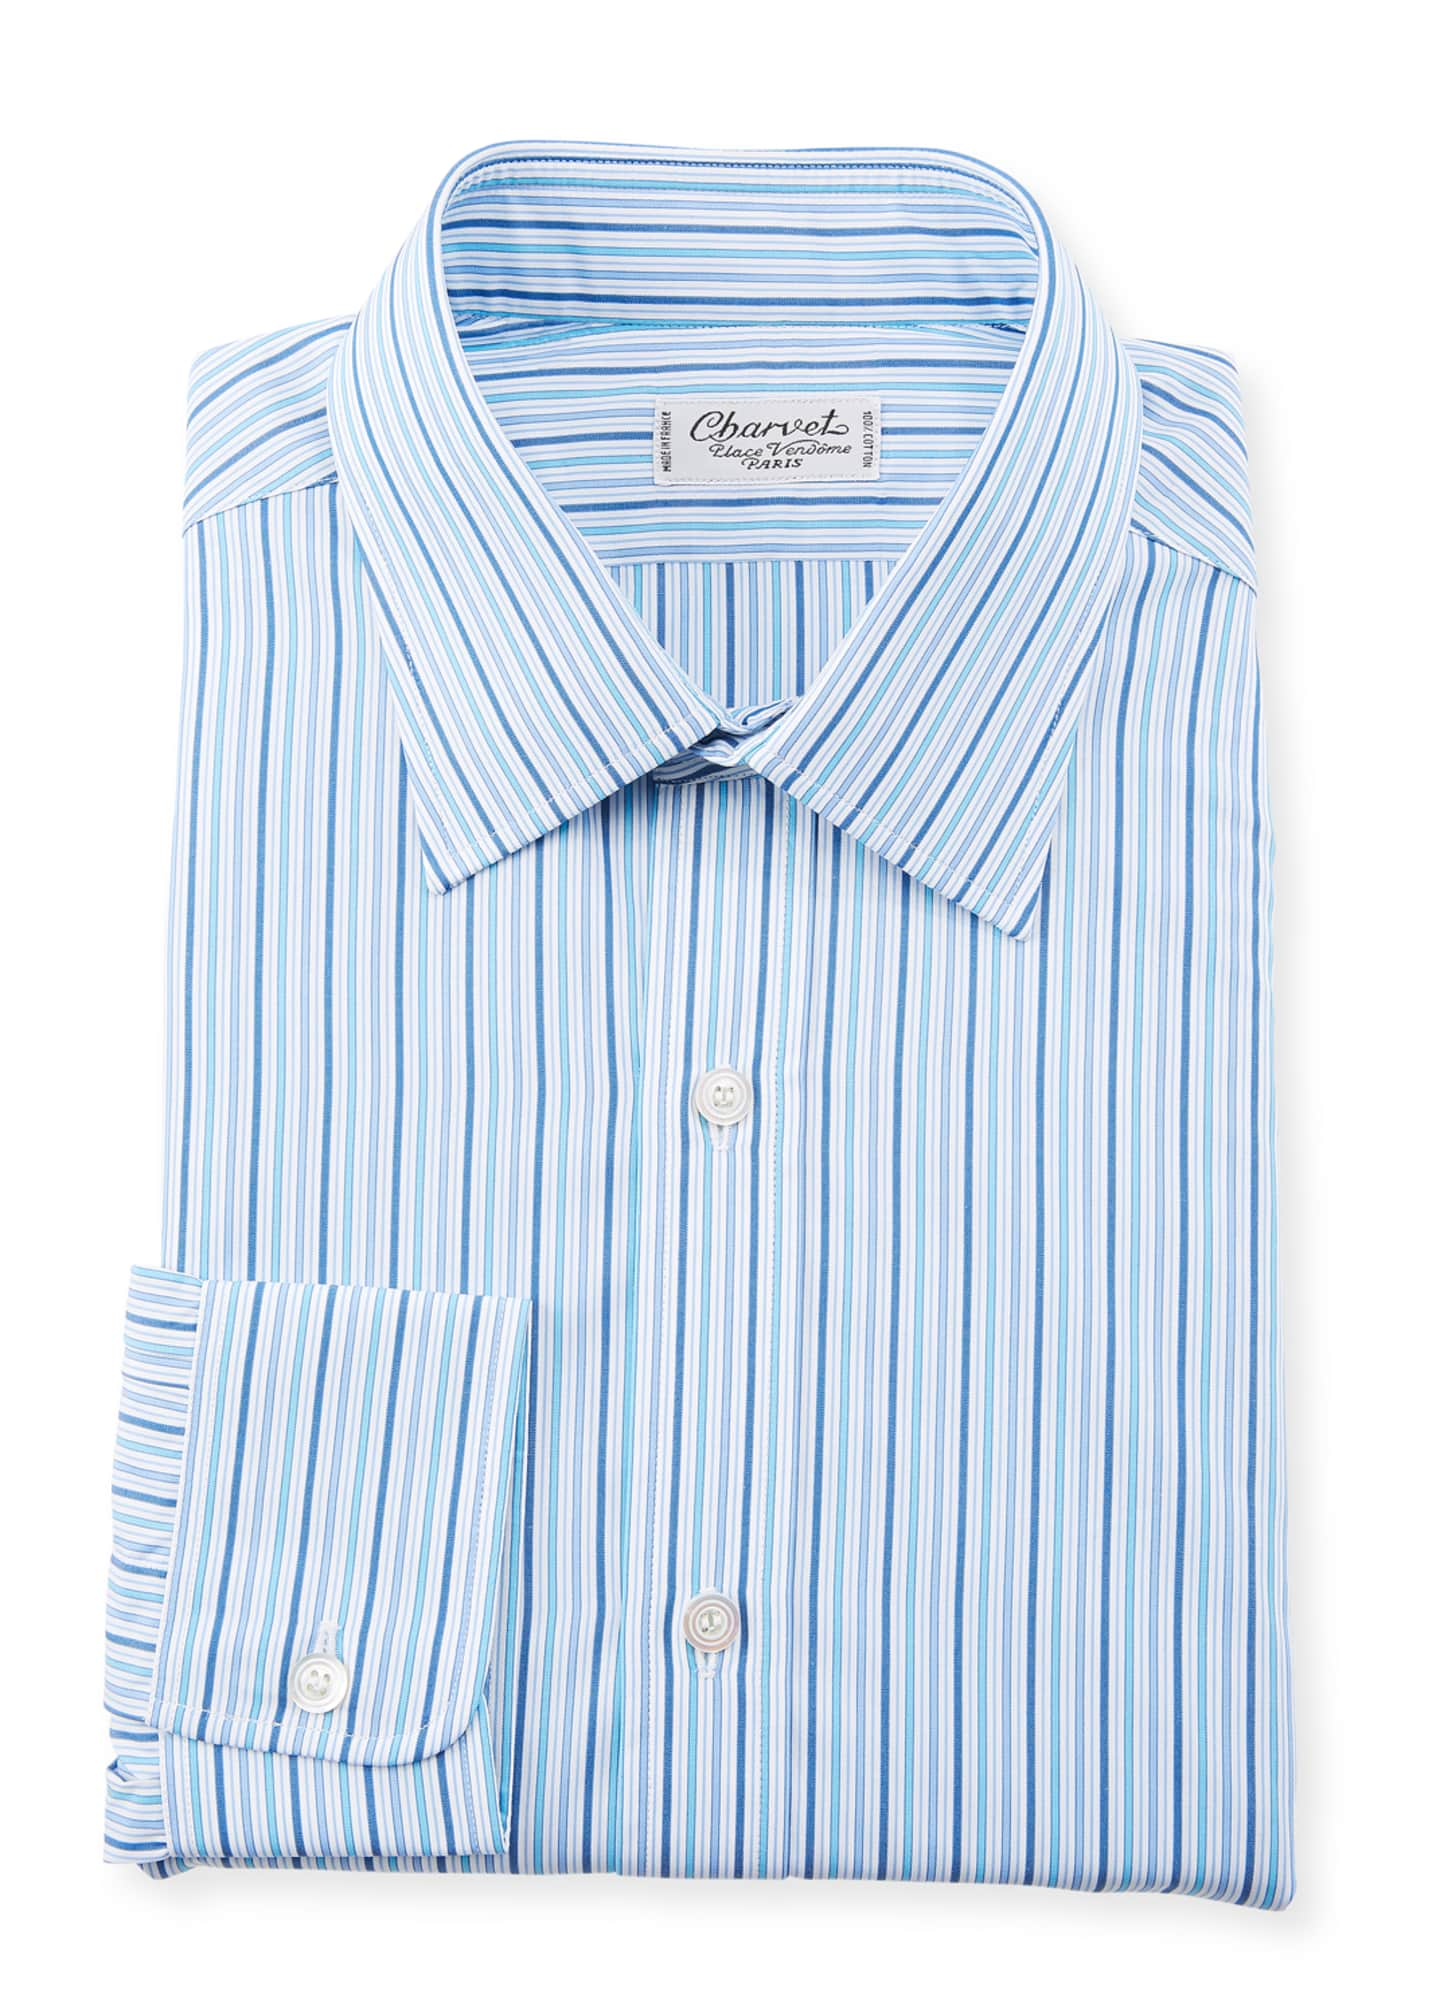 Charvet Men's Striped Dress Shirt